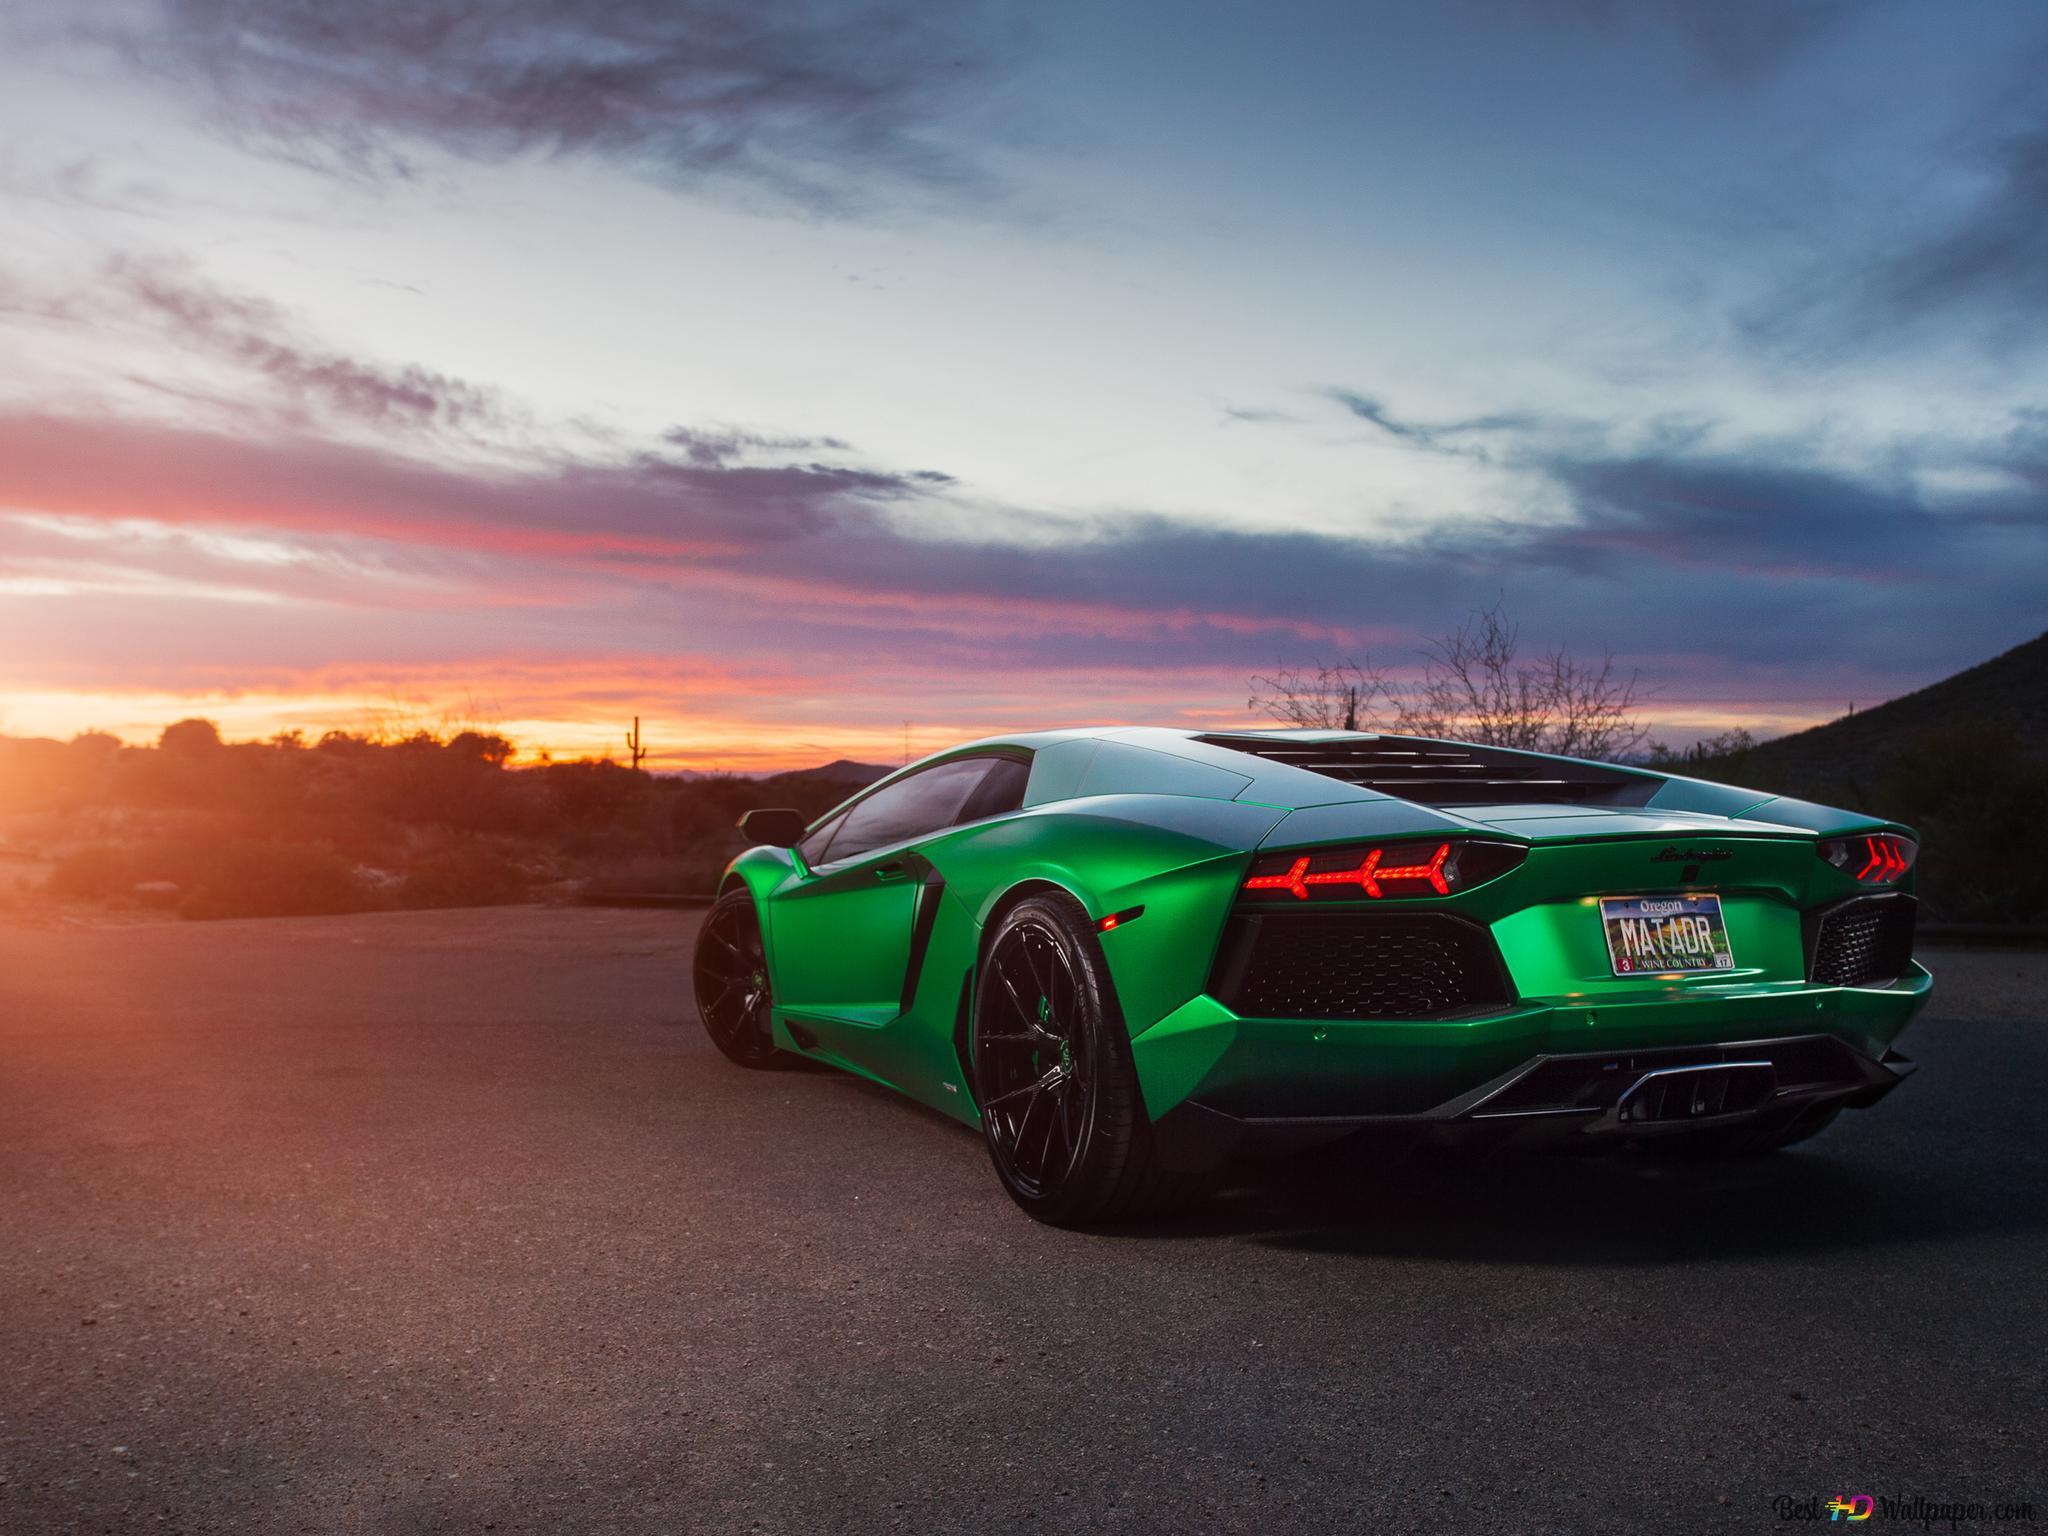 Green Lamborghini Aventador Hd Wallpaper Download